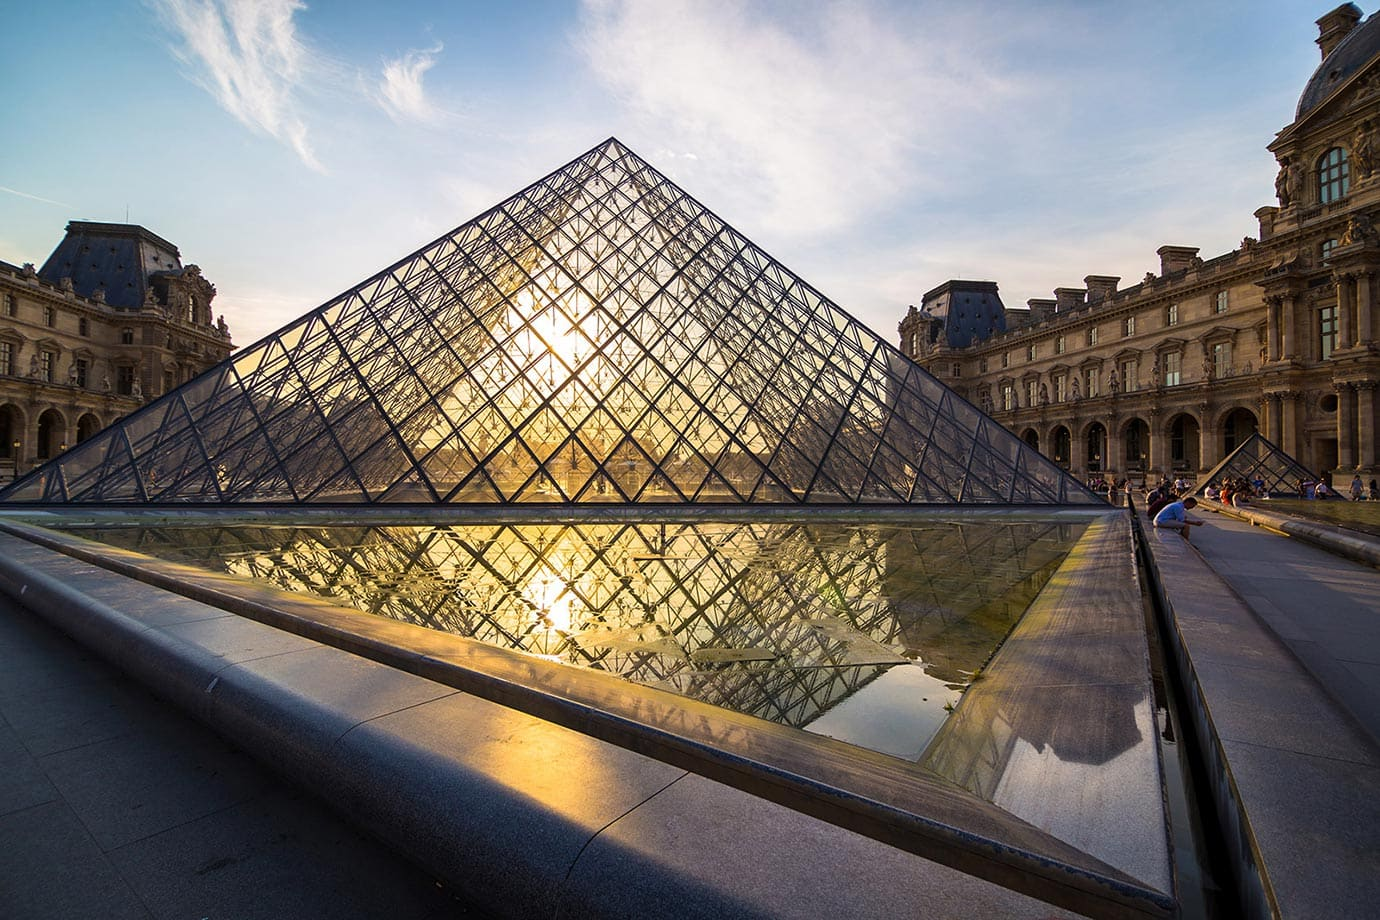 Sunset at the Louvre, Paris